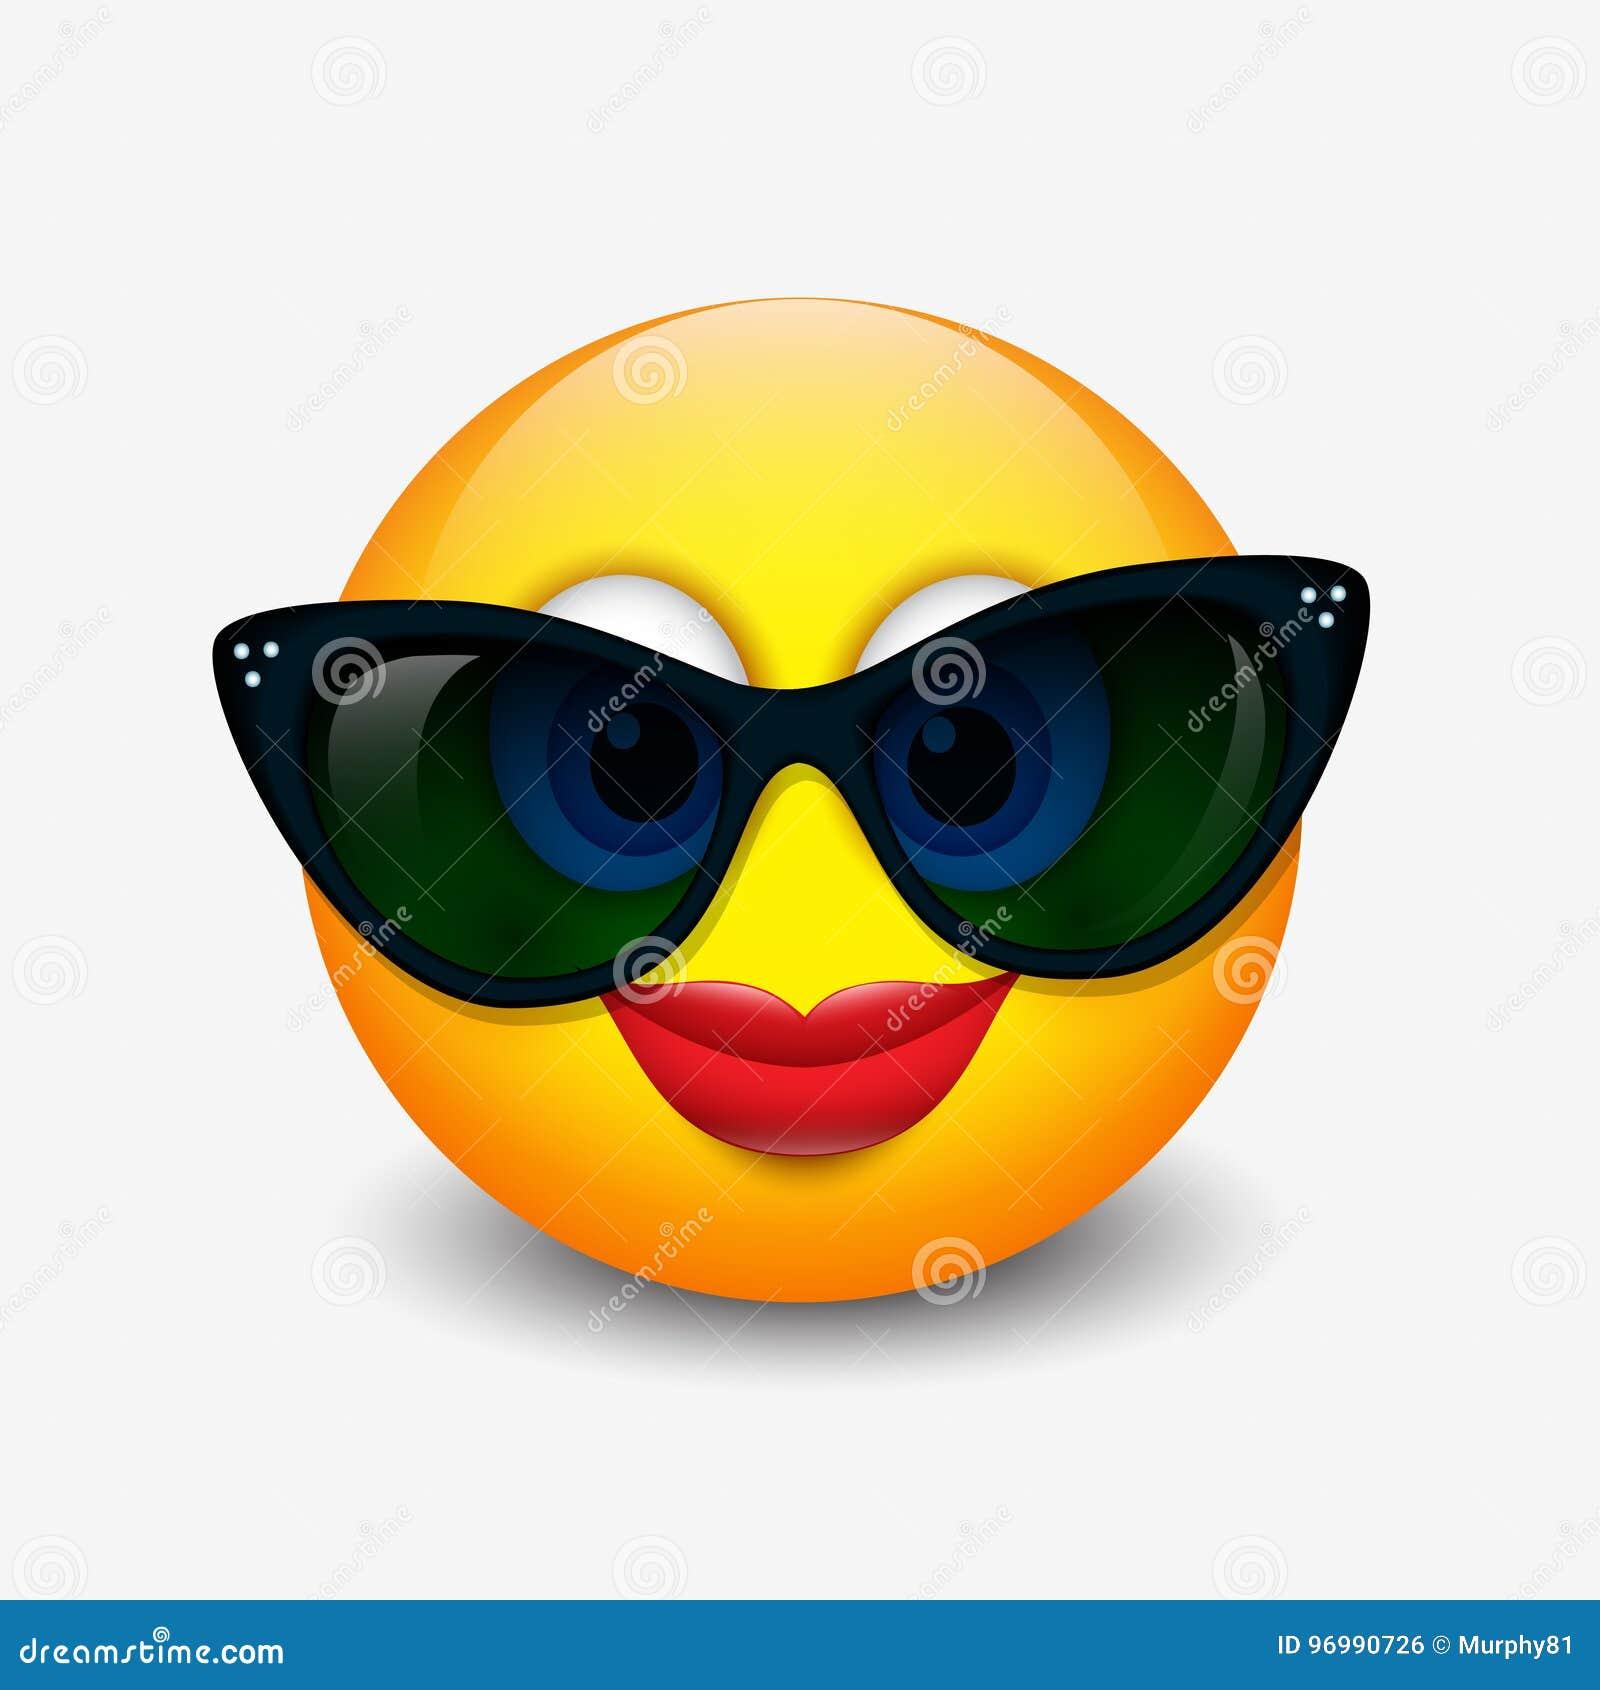 b0f5f6f9a84 Cute Smiling Emoticon Wearing Black Sunglasses